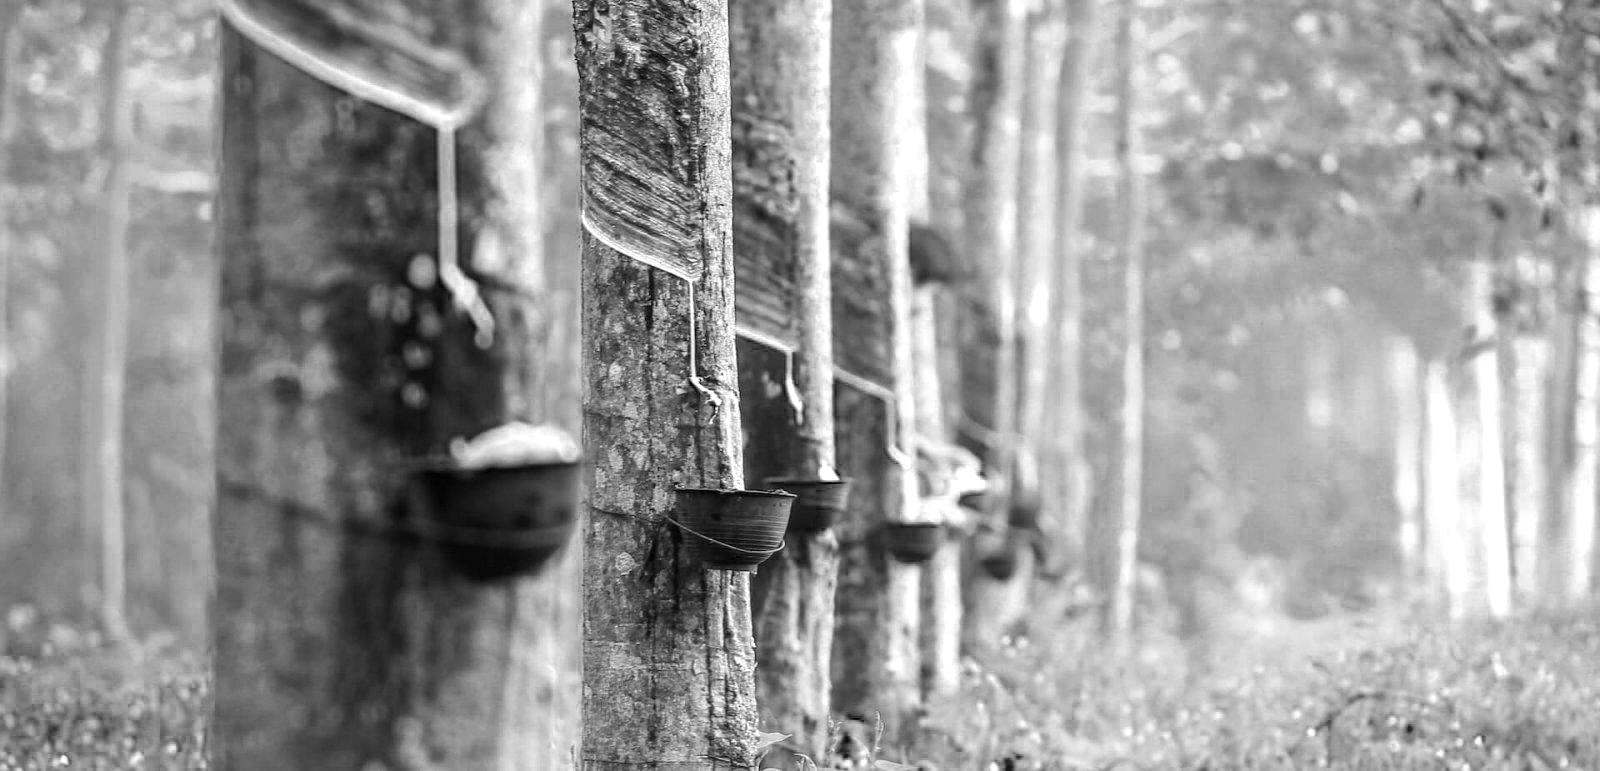 Rubber plant Bnw.jpg